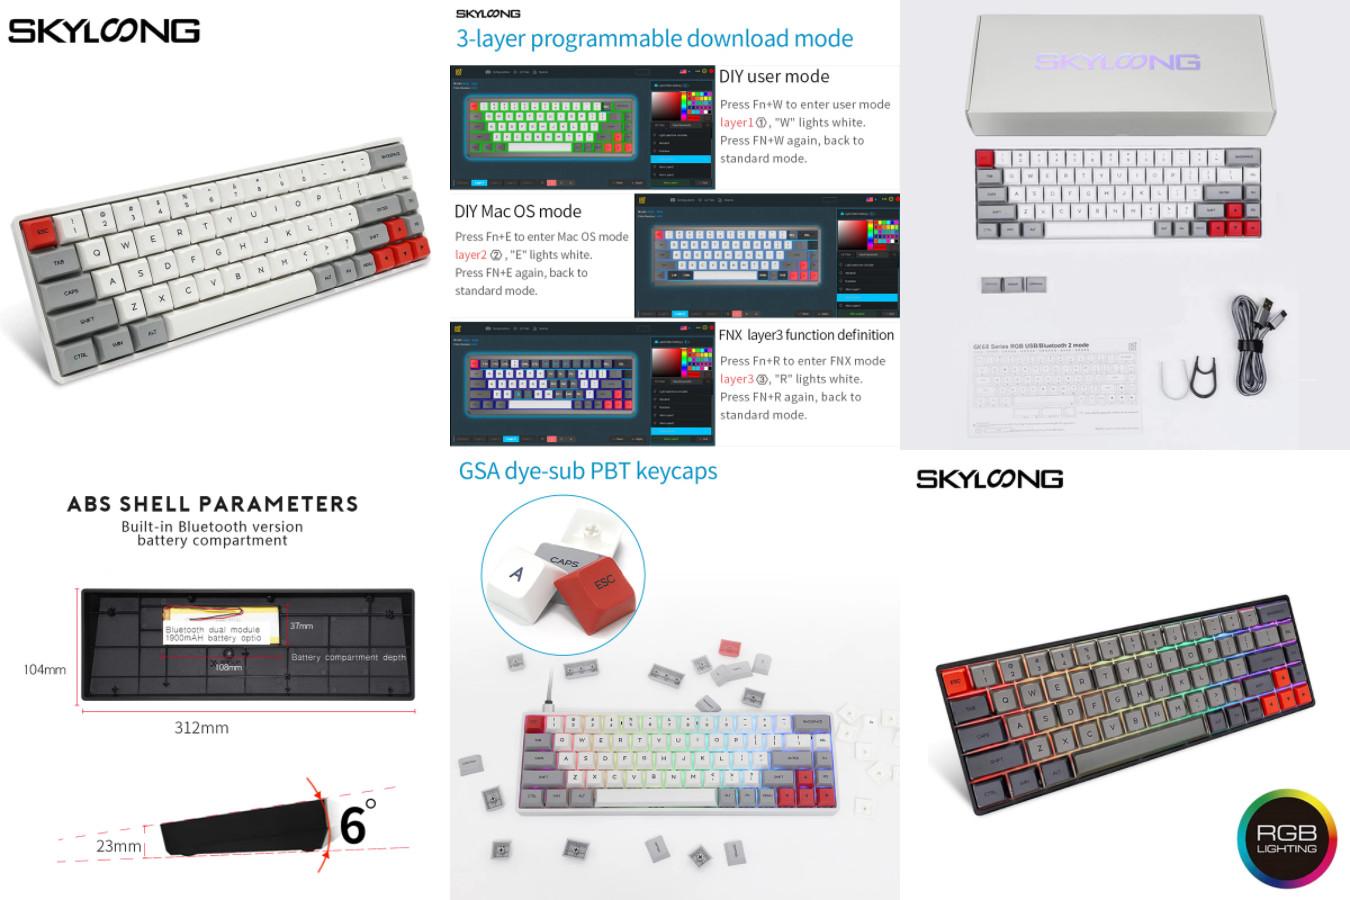 Клавиатура с RGB-подсветкой